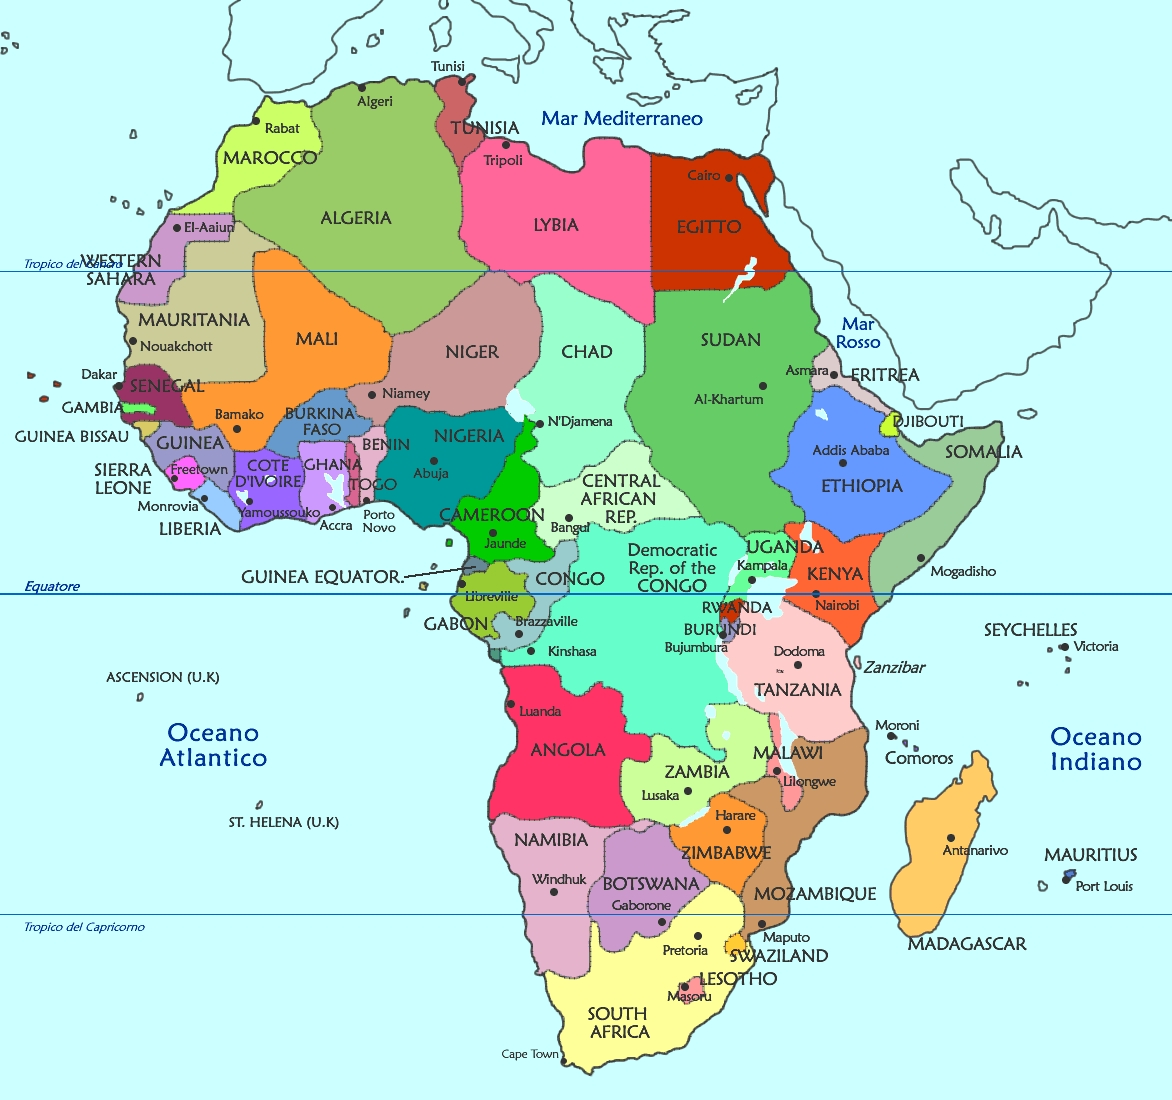 sesso Kenya Uganda Tanzania Robert Pattinson Kristen incontri